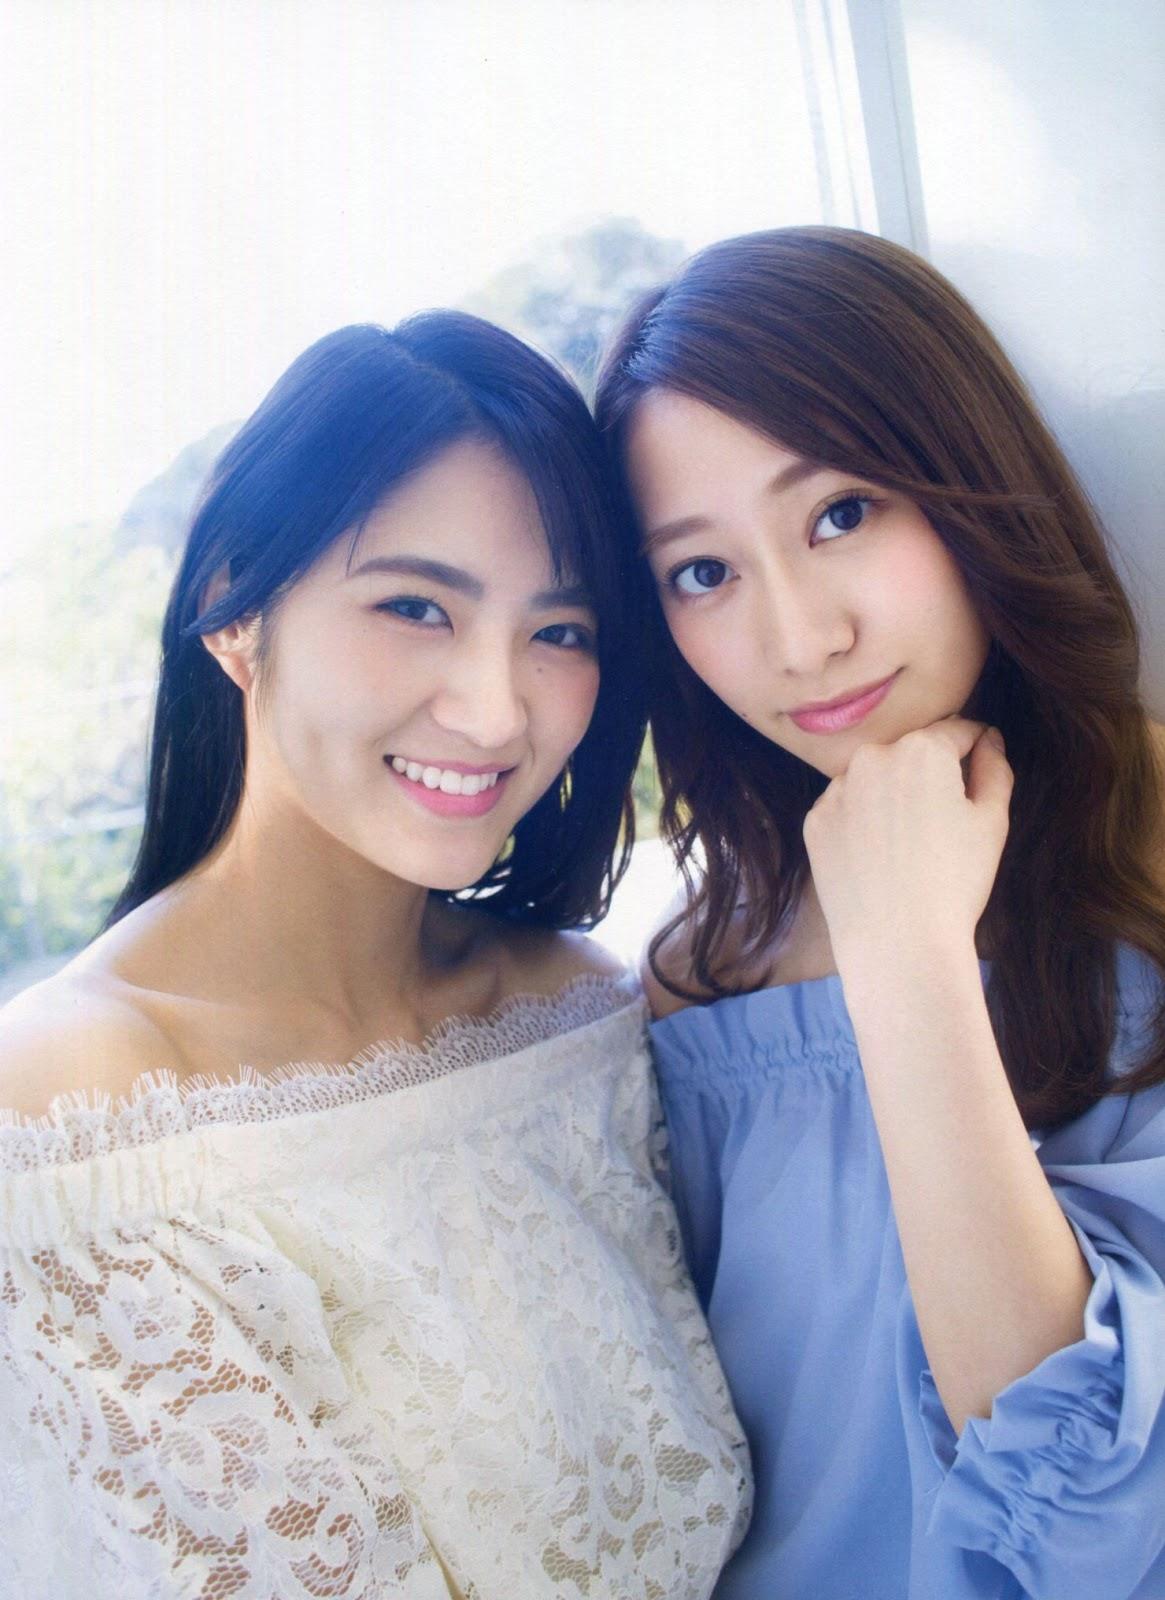 Nogizaka46 乃木坂46, Platinum FLASH 2018 vol.3 (プラチナフラッシュ 2018 vol.3)